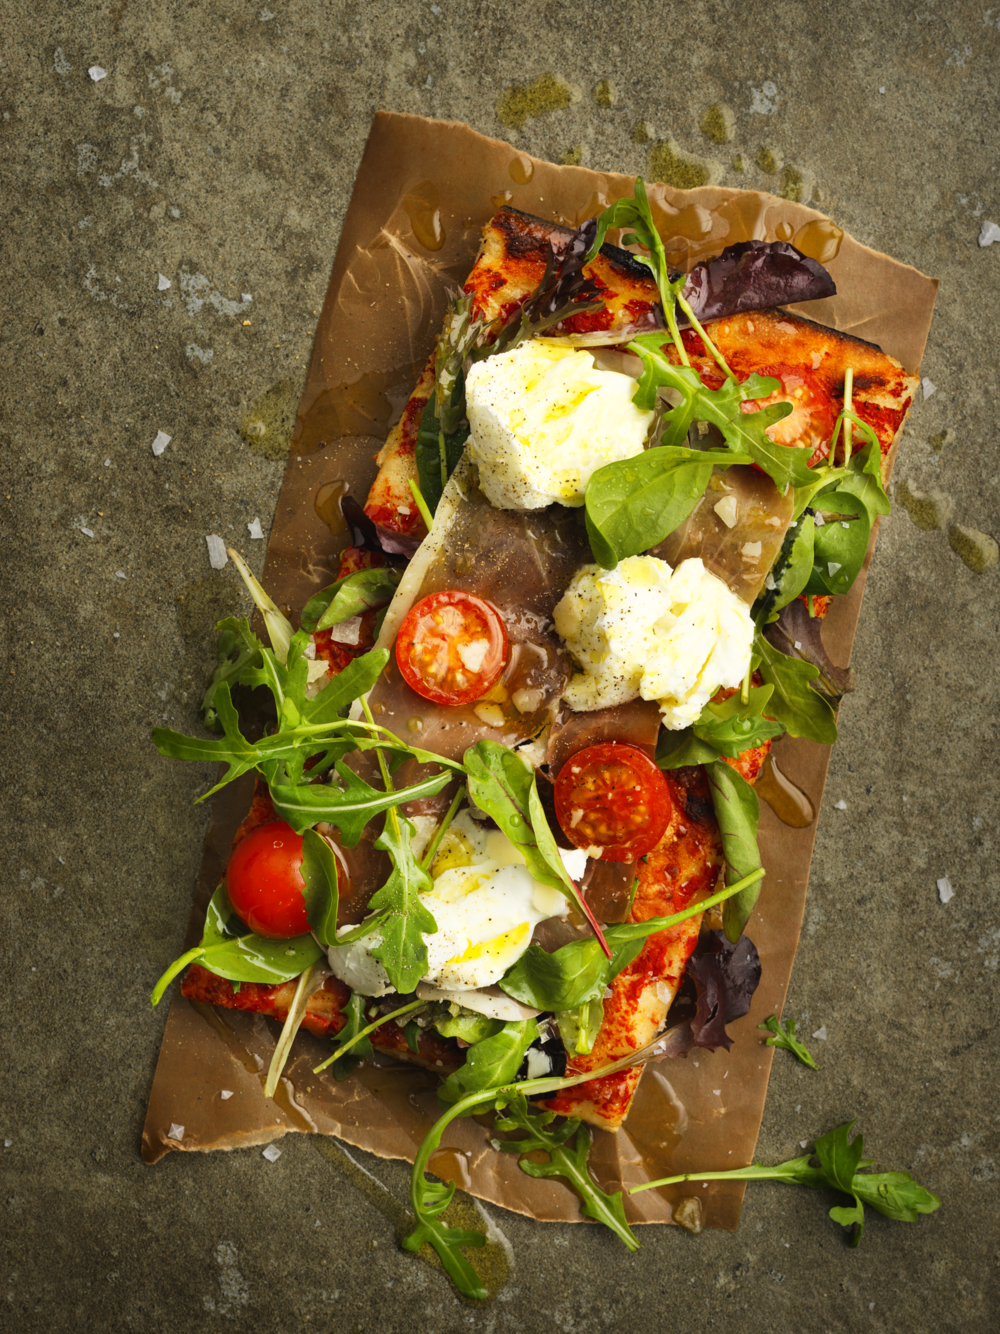 Stenugnsbakad Surdegspizza69:- eller 2st 99:- - Pizza SalamiTomatsås, mozzarella, salami, basilikaPizza ProsciuttoTomatsås, mozzarella, basilika, prosciuttoPizza ZucciniTomatsås, mozzarella, zuccini, soltorkade tomaterPizza PotatisPotatis, blue cheese och valnötter Bianco (utan tomatsås)